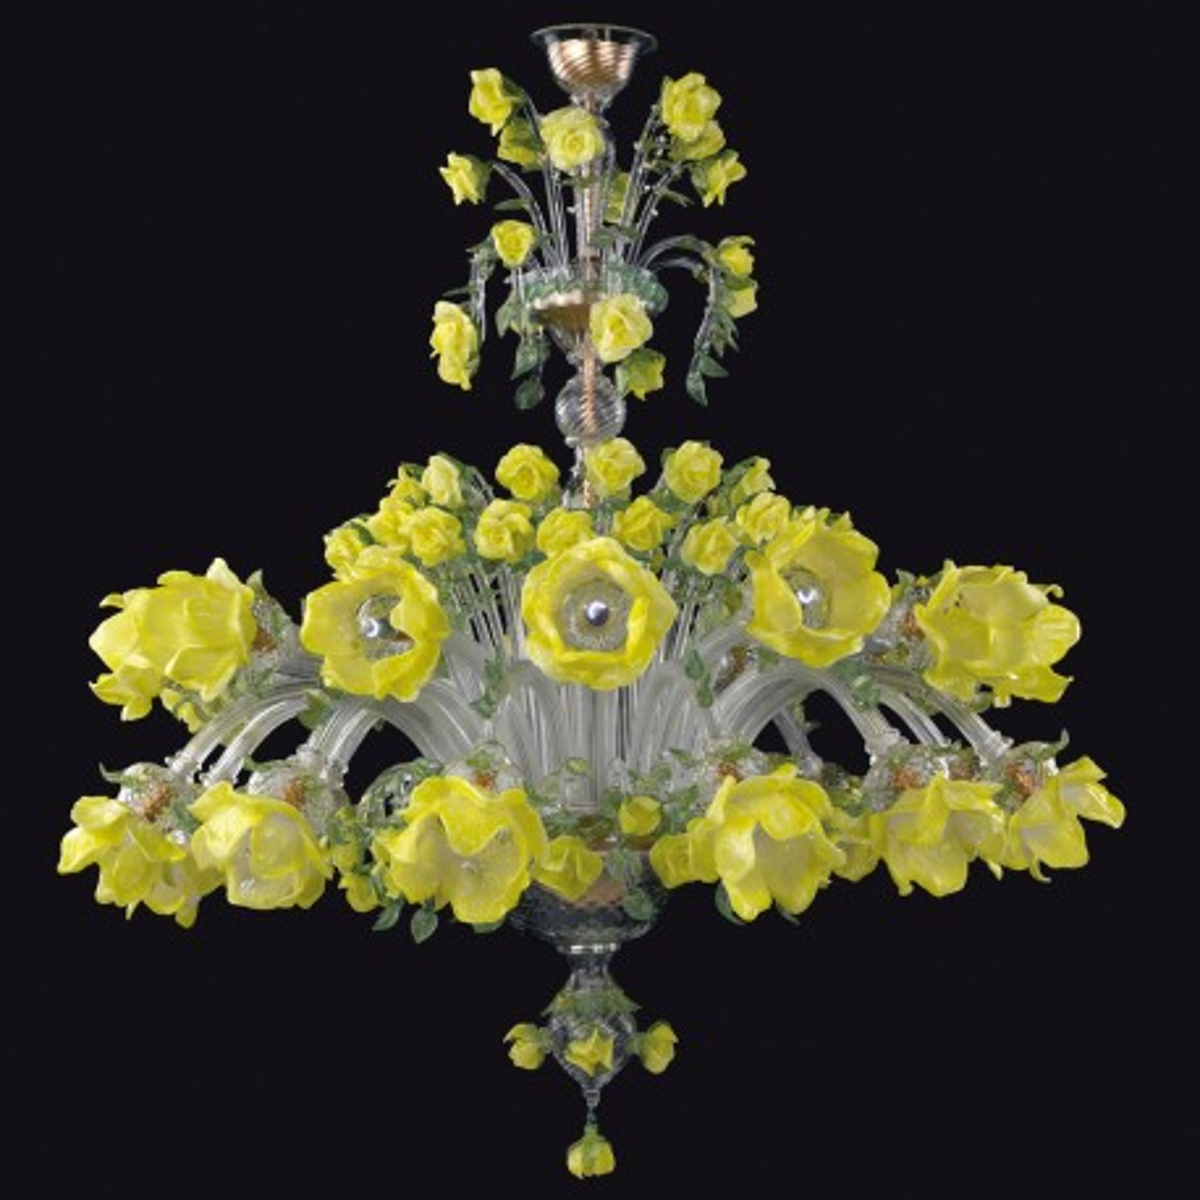 """Rose gialle"" Murano glas Kronleuchter - 12+12 flammig"